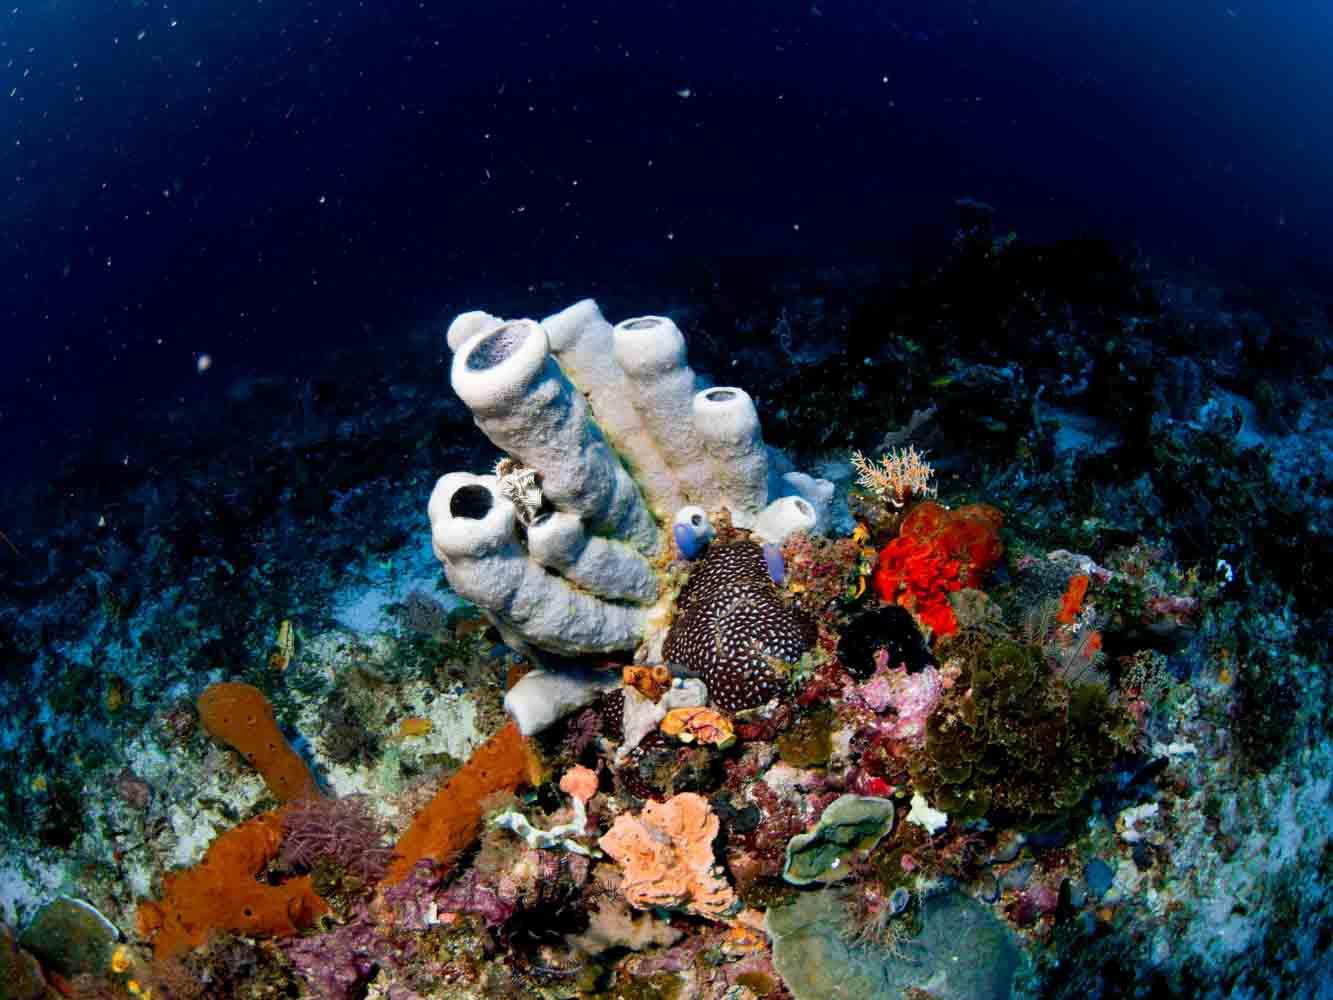 Raja Ampat Indonesien Tauchsafari, Nemo, Wobbegong, Teppichhai, Manta